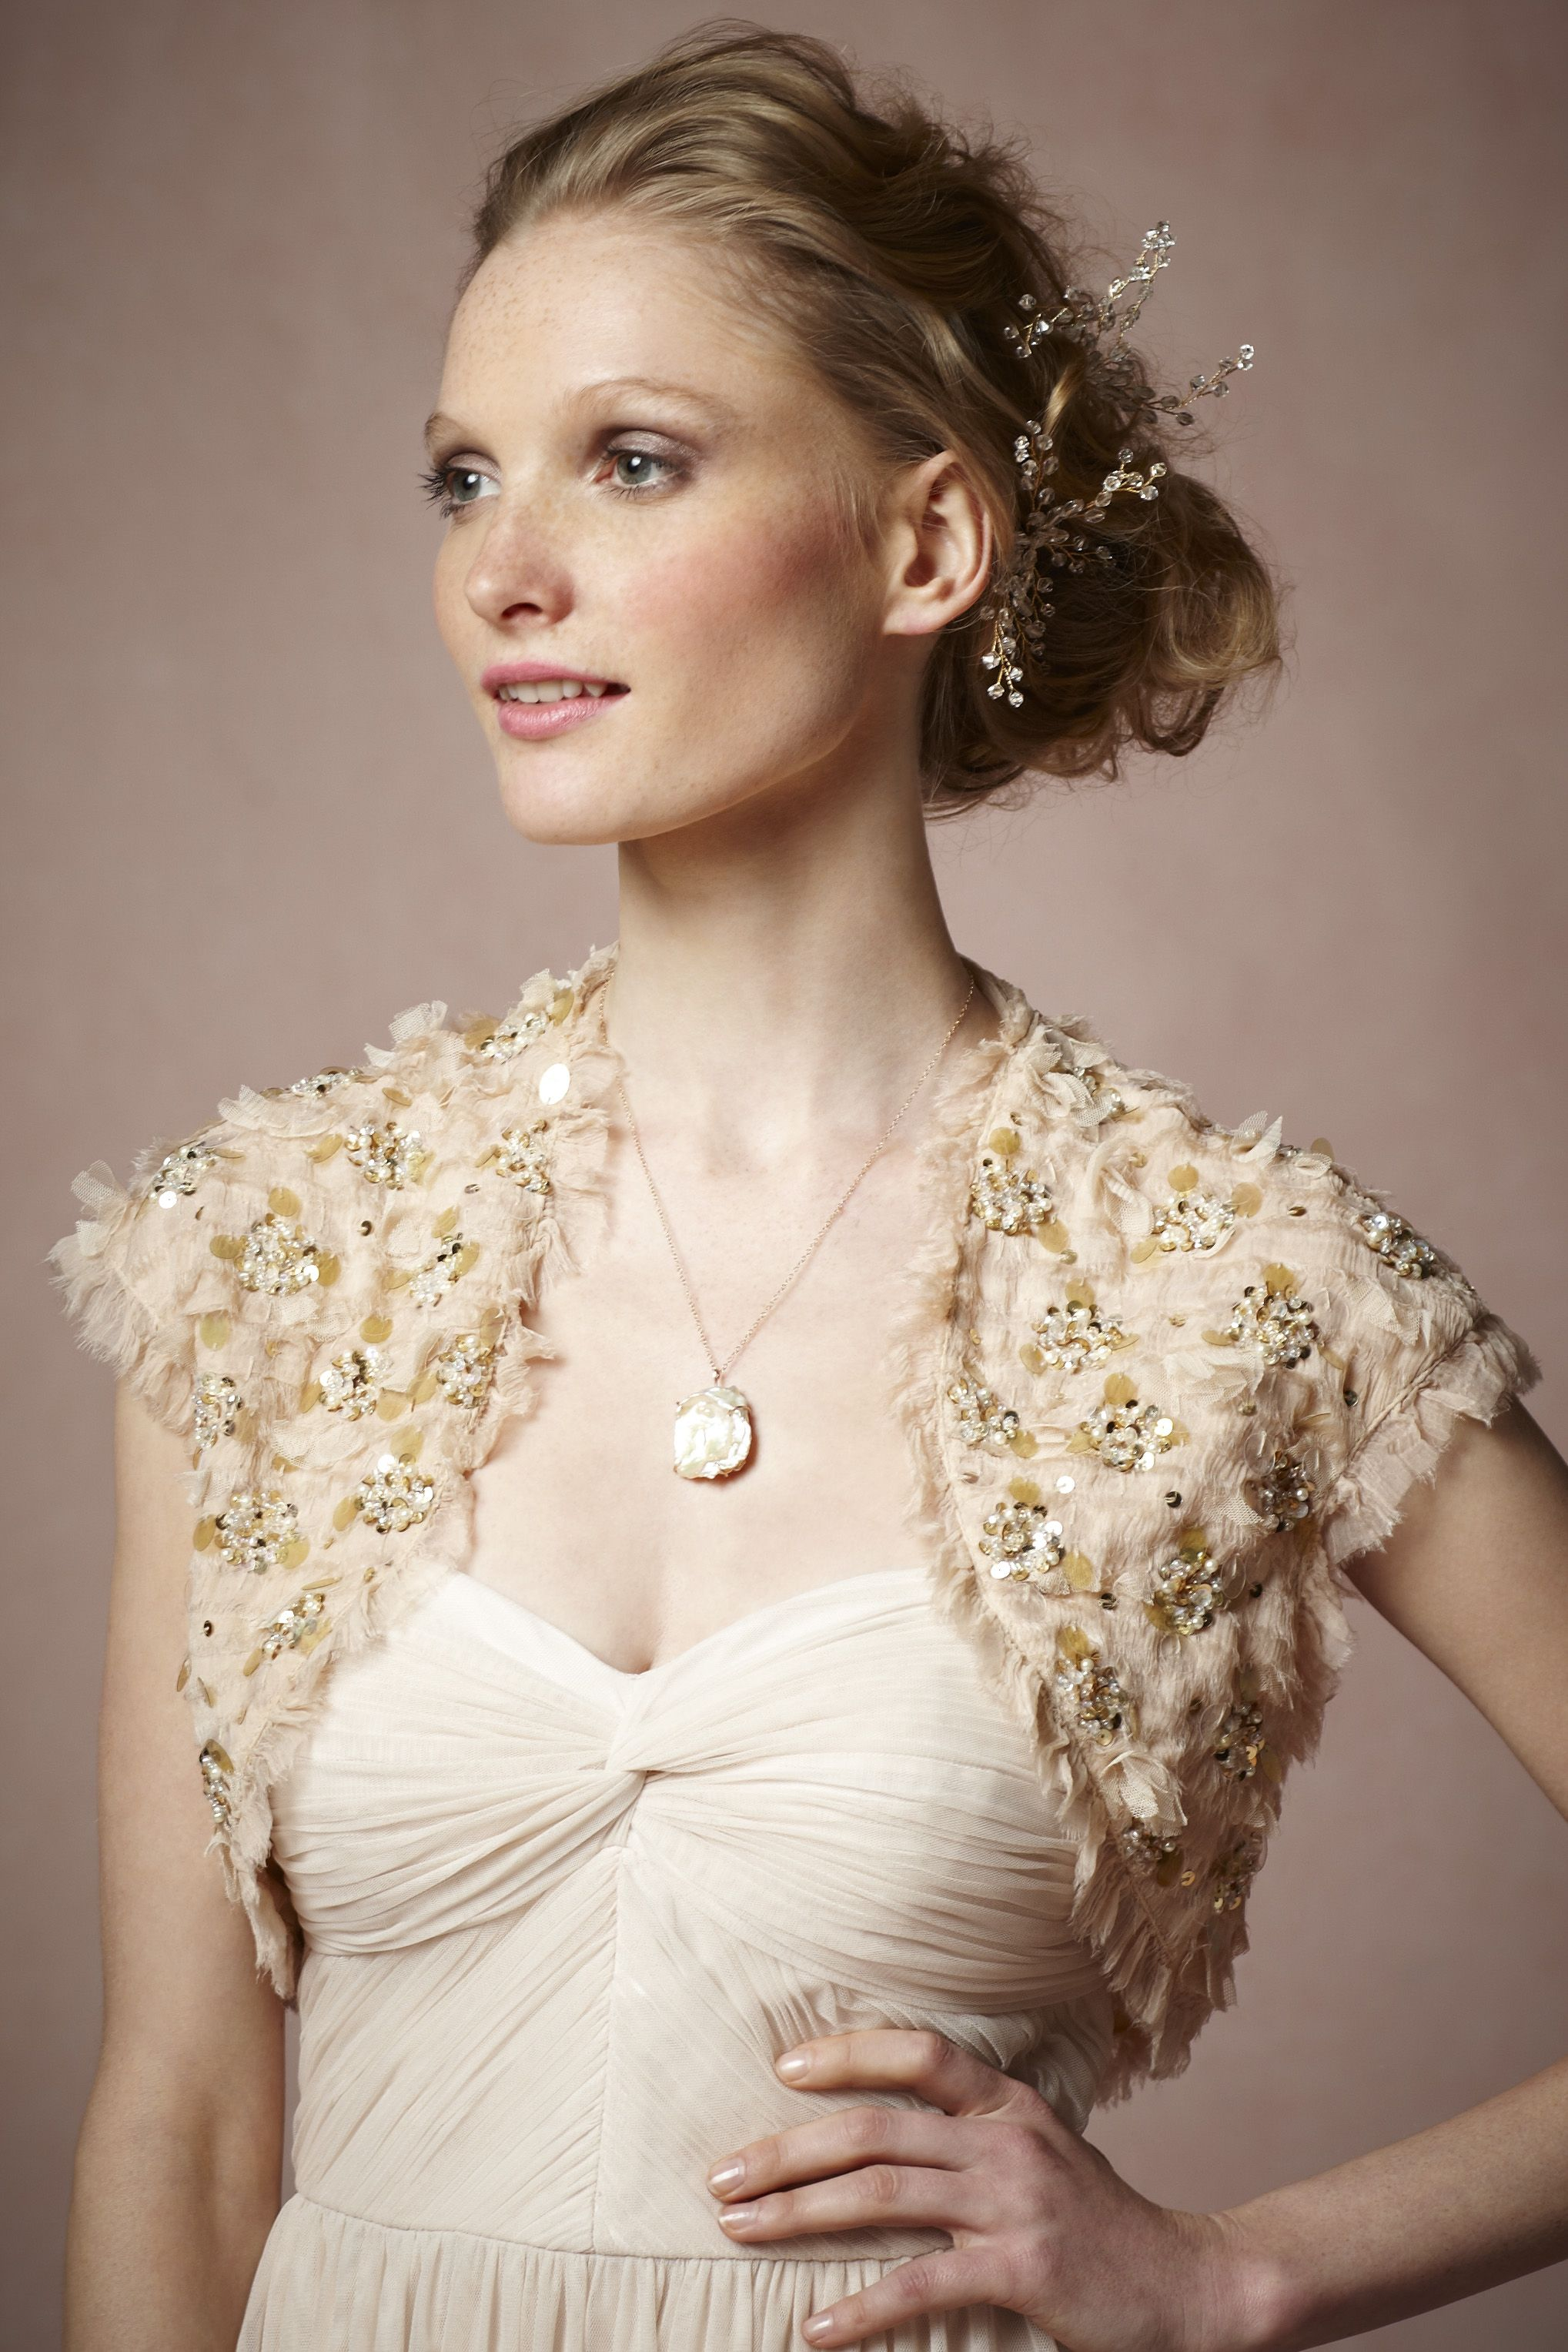 Wedding Dresses Vintage Inspired Wedding Dresses Bhldn Wedding Dresses Wedding Dresses Vintage Vintage Inspired Wedding Dresses